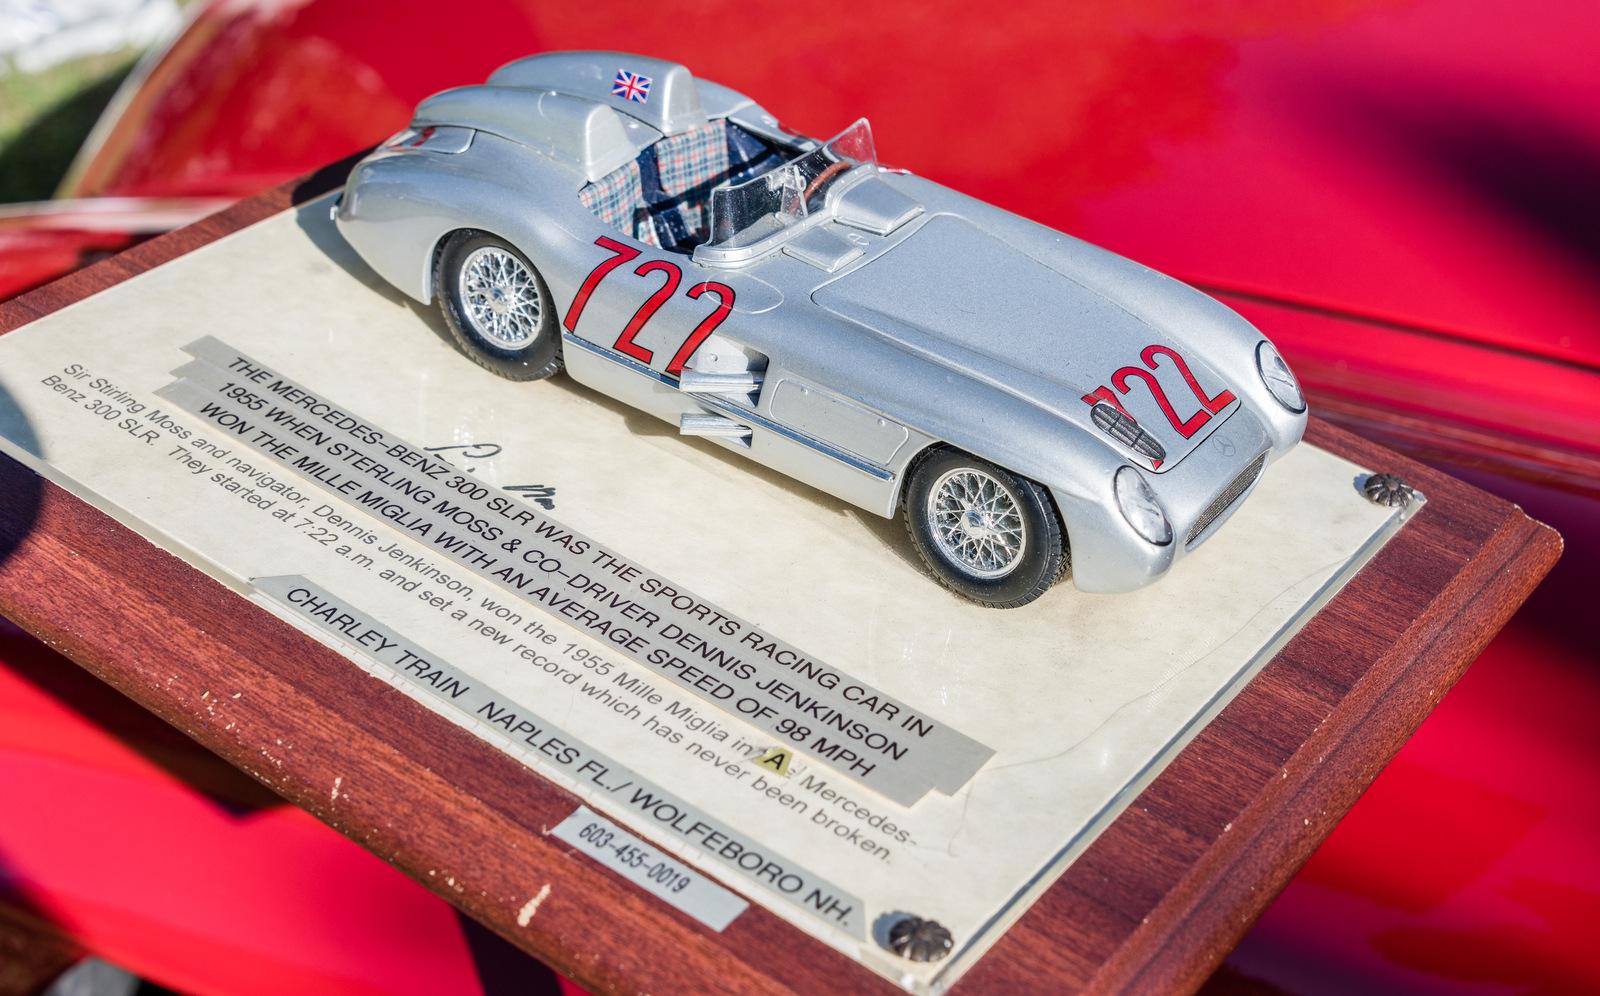 Antique Auto Show At Naples Depot Part JBIPix A Personal - Car show naples fl today